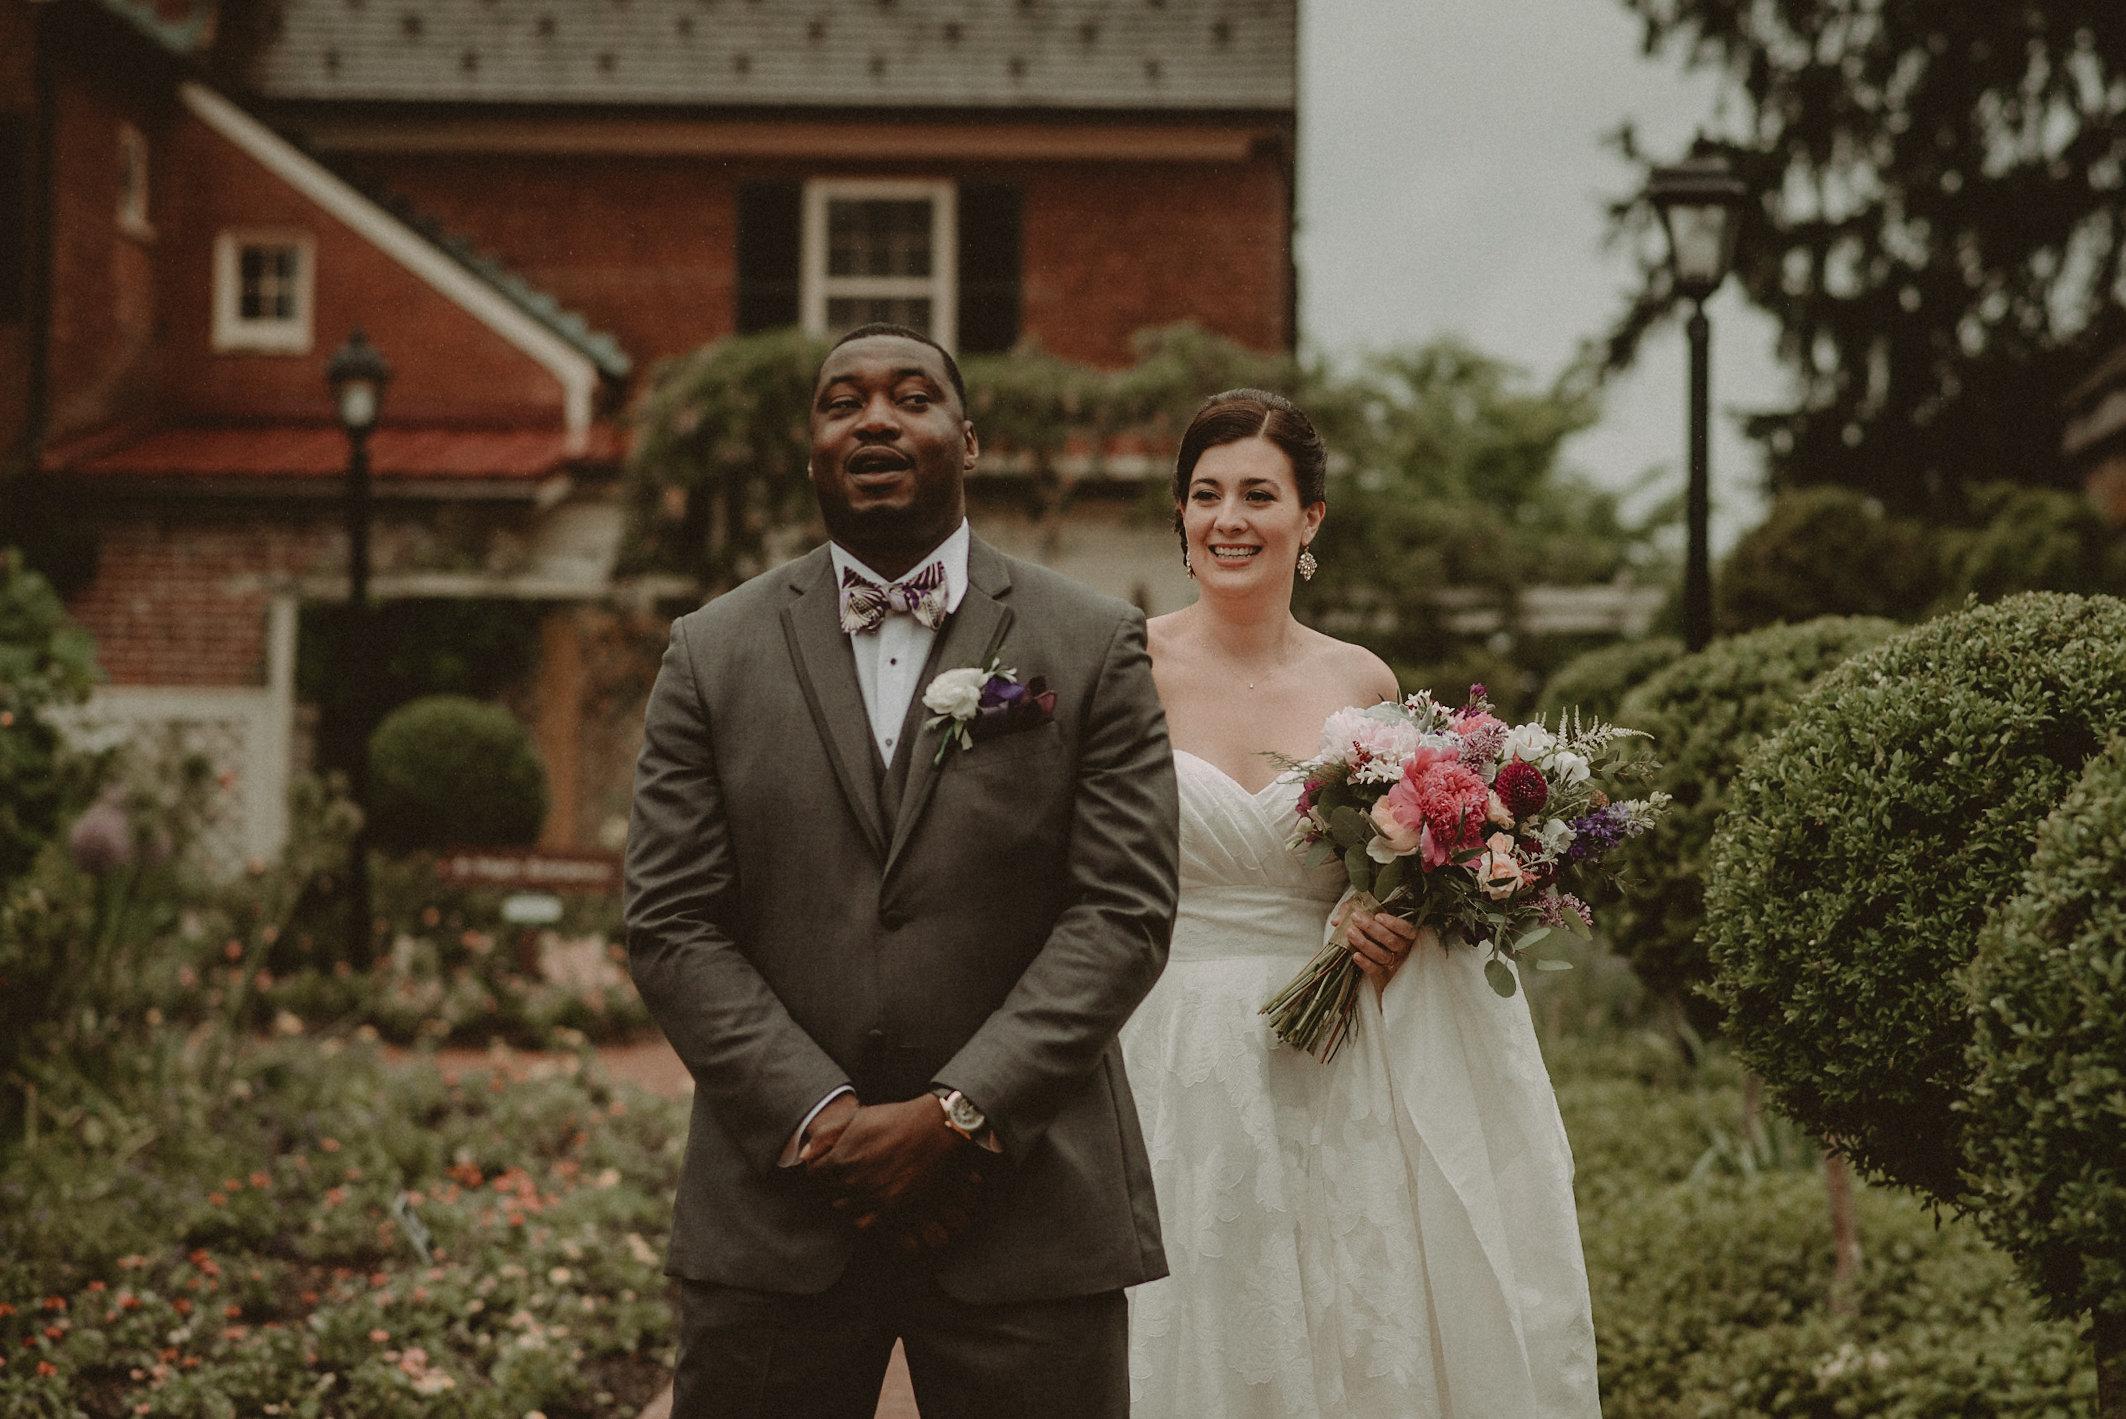 Bride and groom first look before wedding